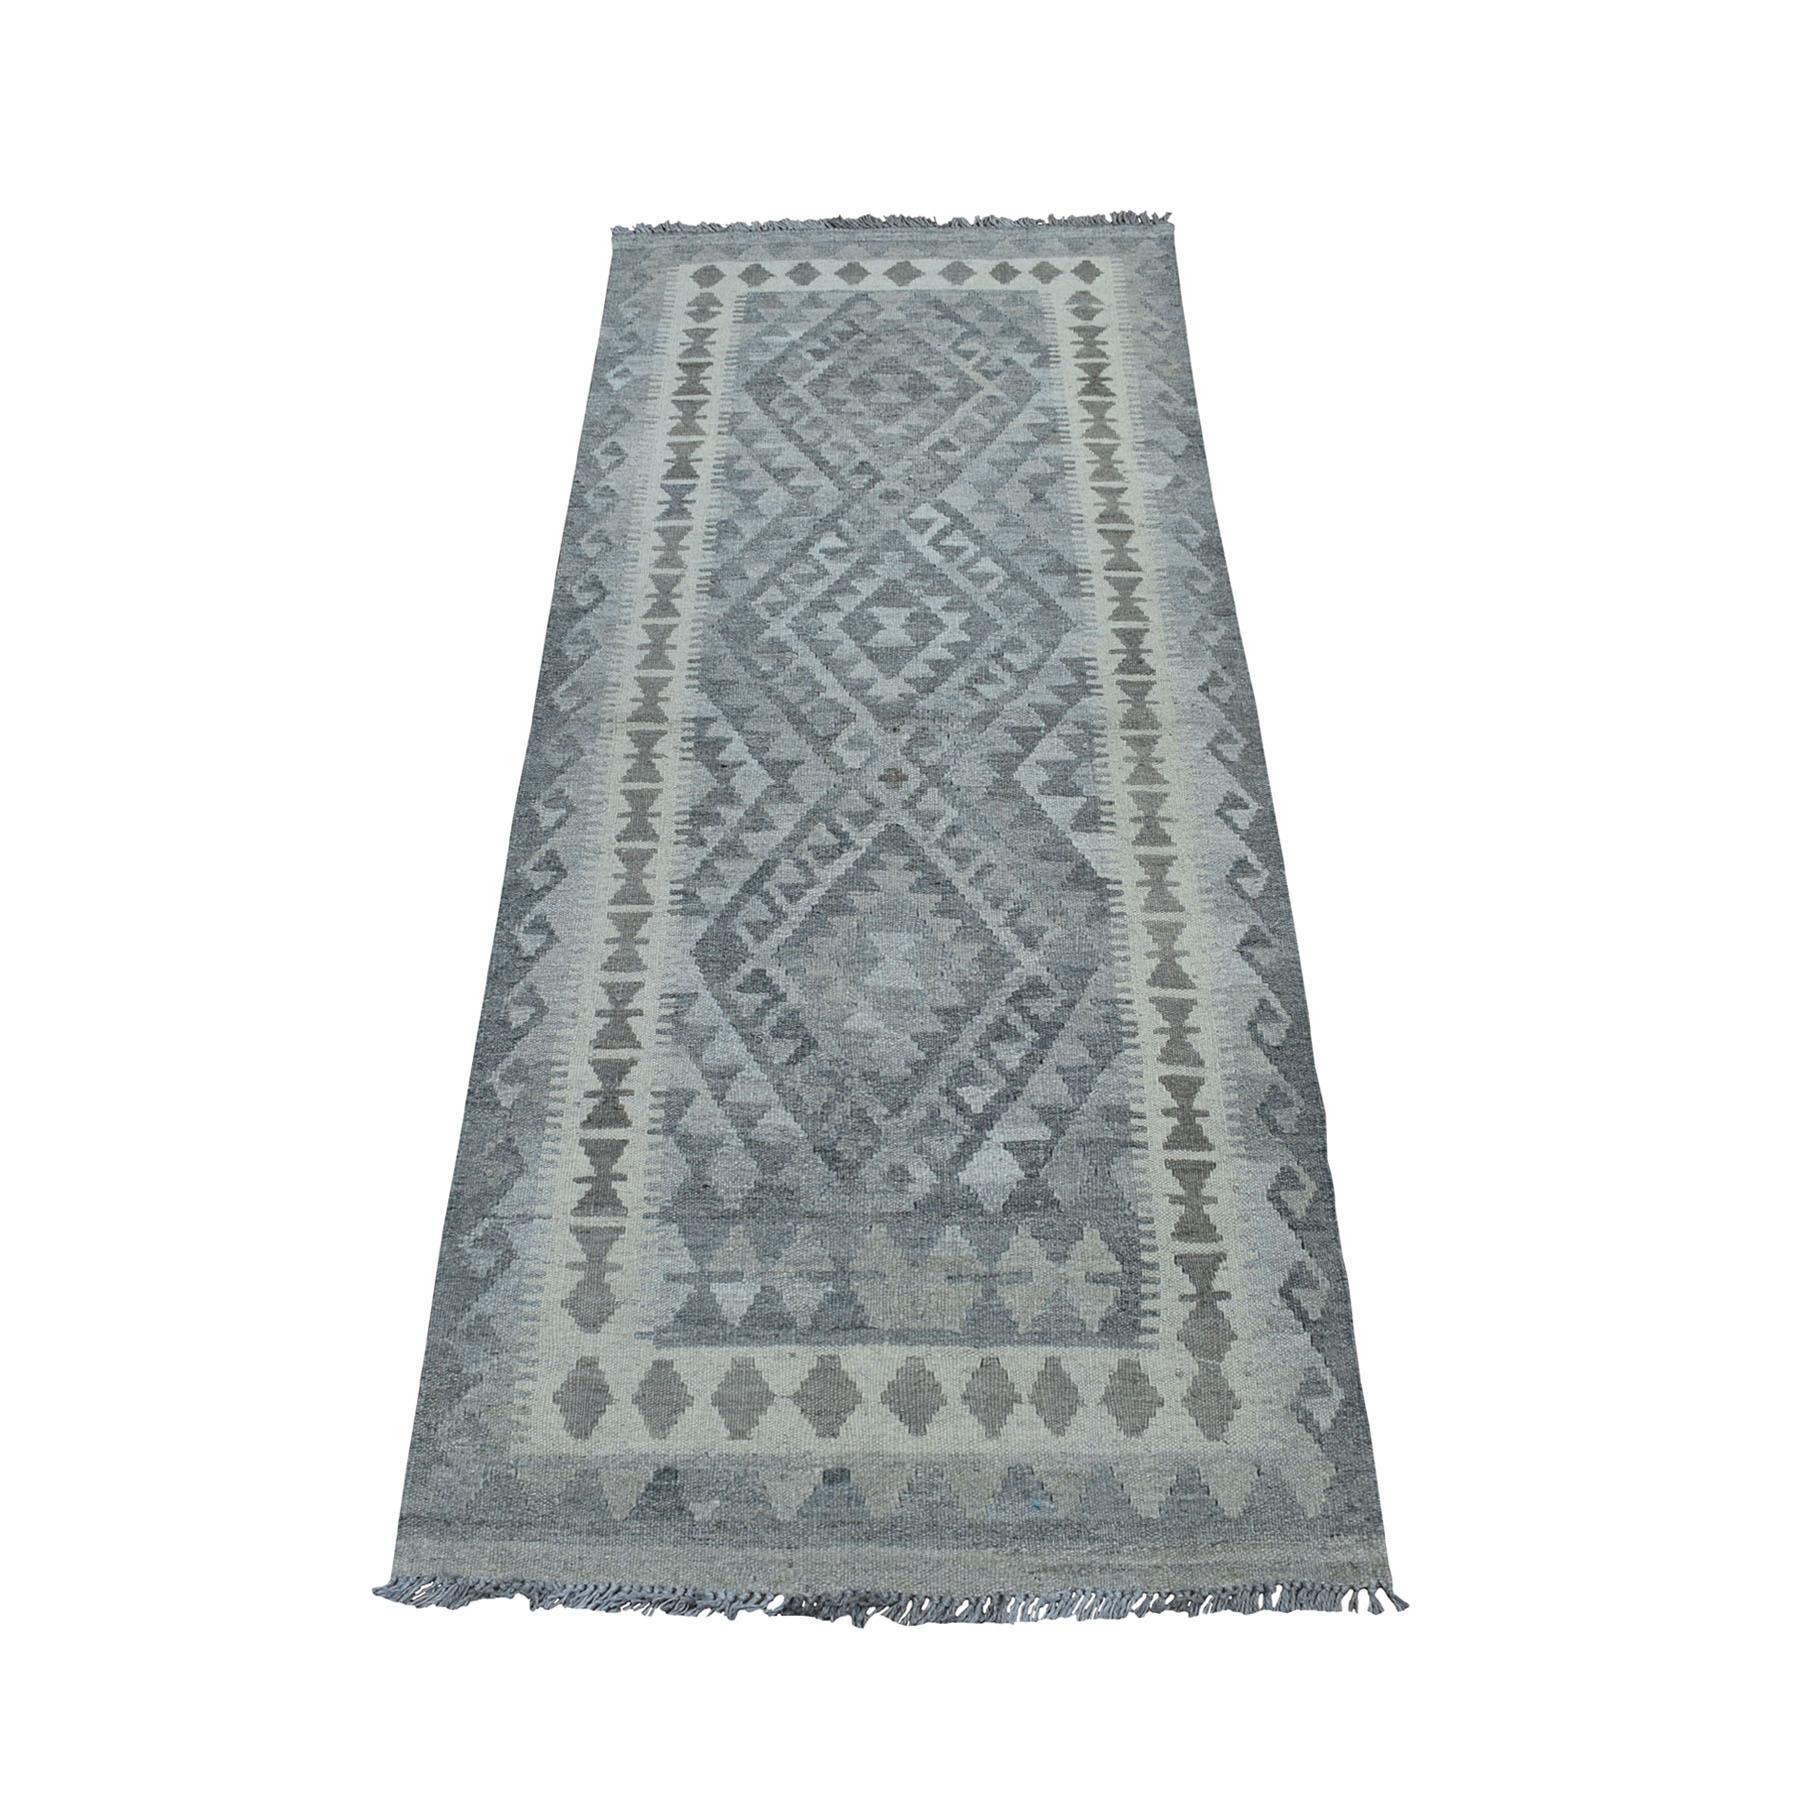 "2'8""x6'4"" Undyed Natural Wool Afghan Kilim Reversible Hand Woven Runner Oriental Rug 53076"